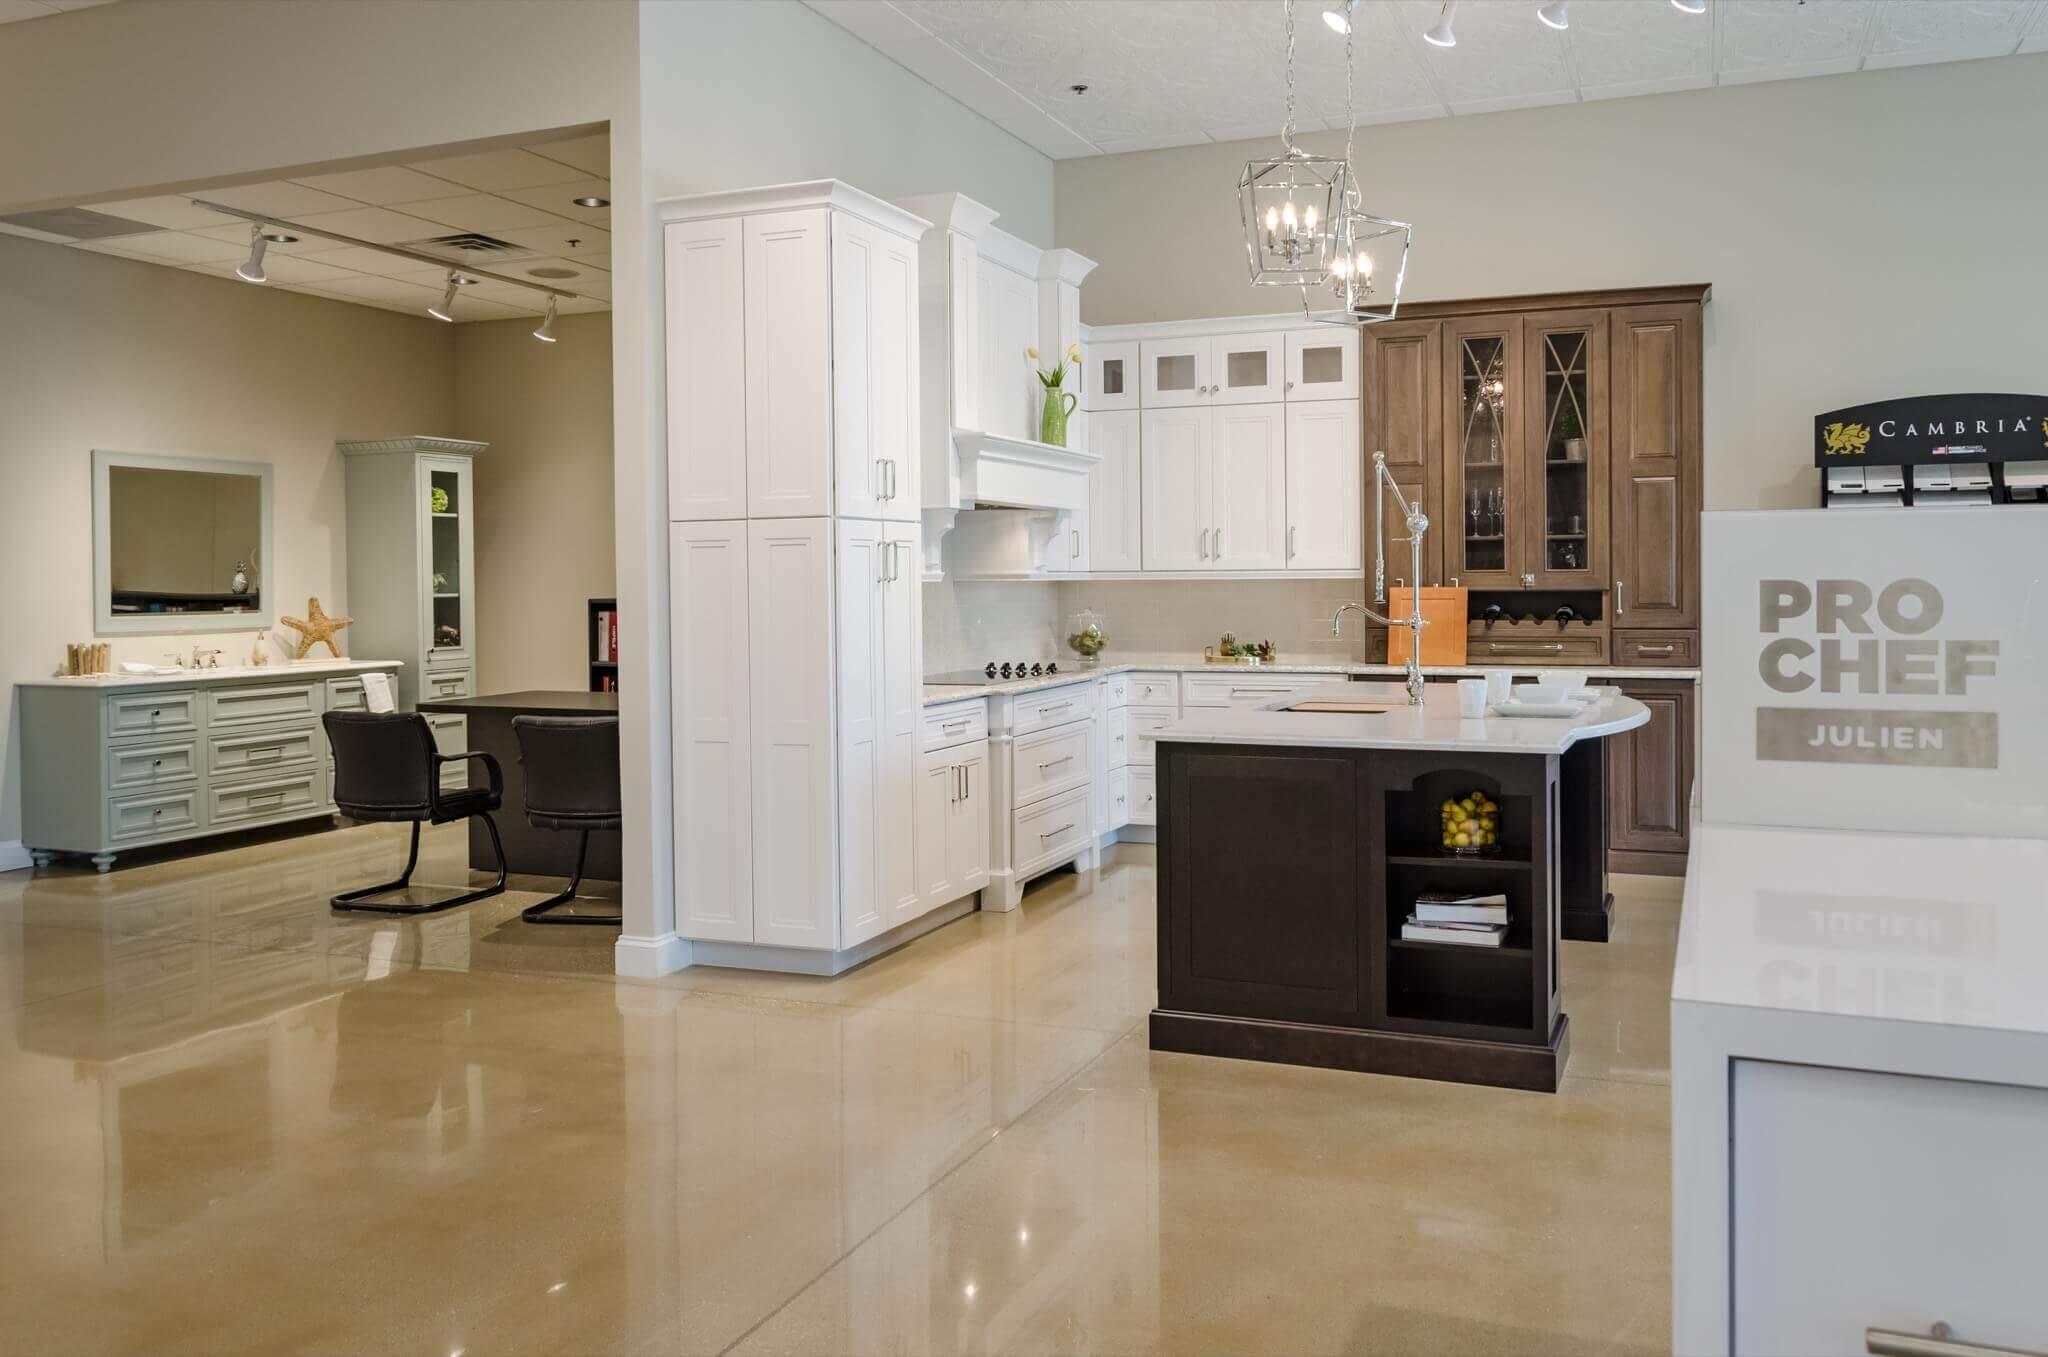 kitchen design naperville home depot canada faucets studio41 showroom locations virtual tour